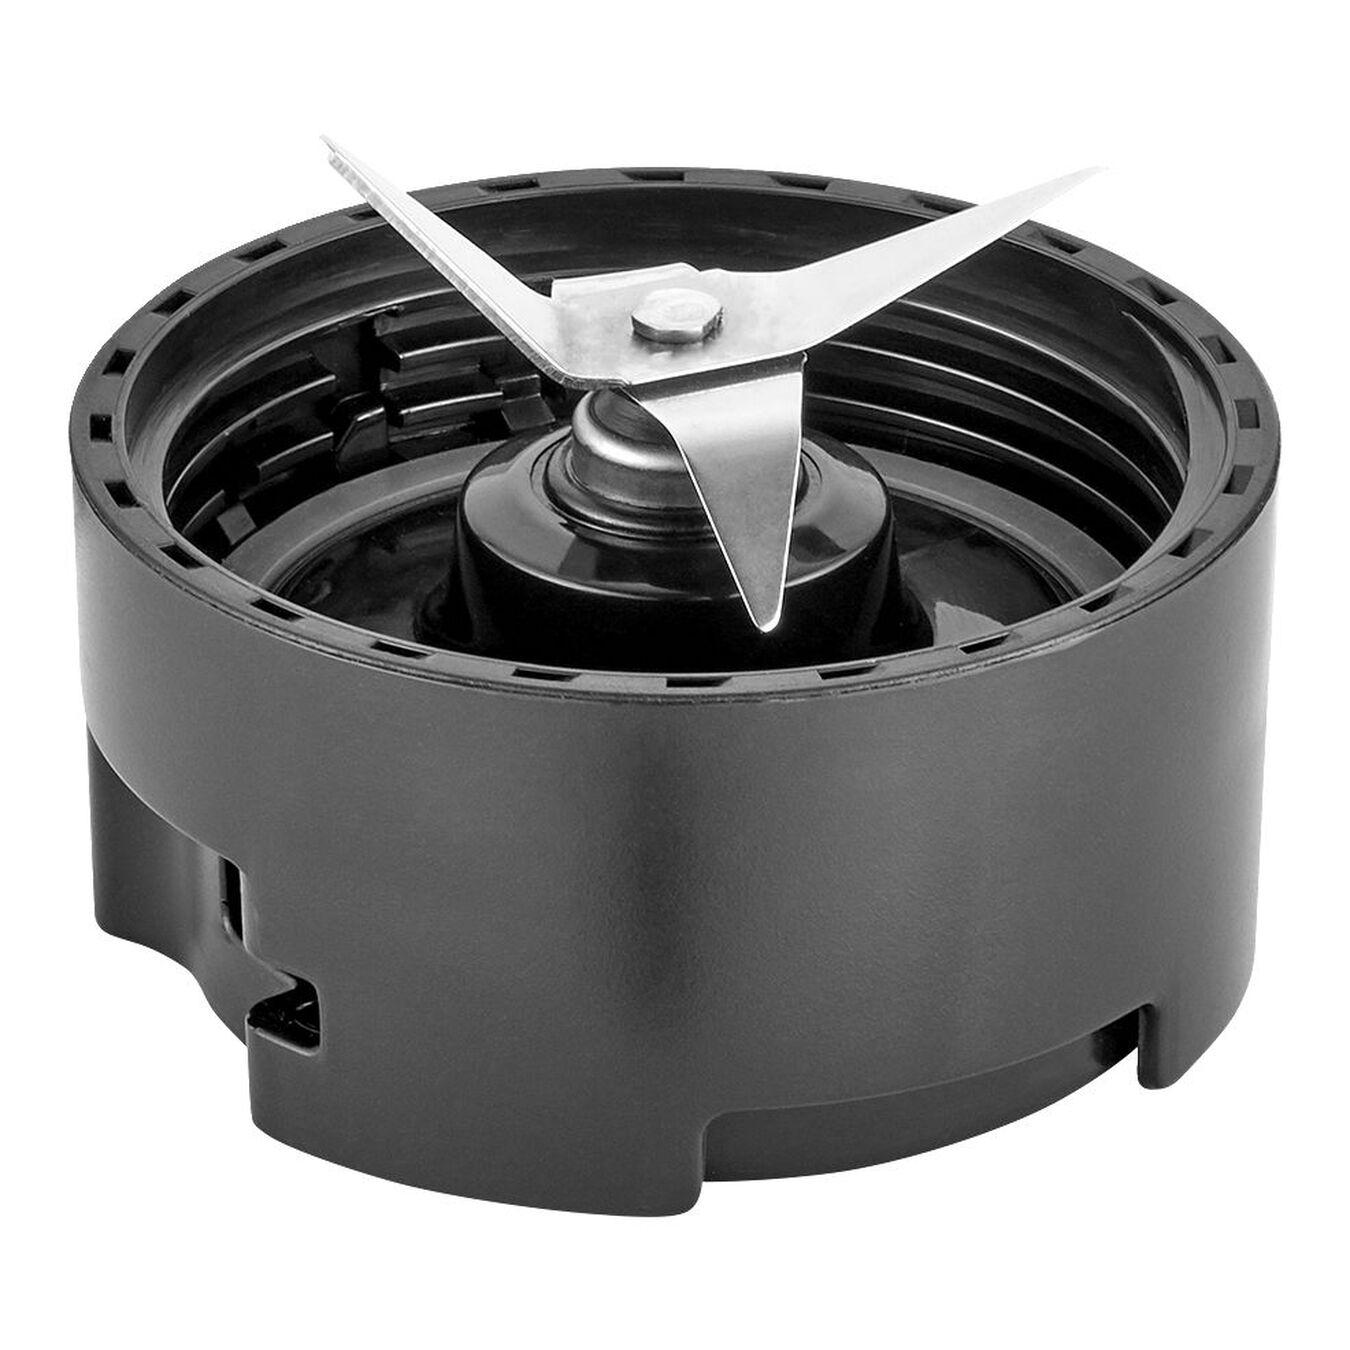 Standmixer, AC Motor, Schwarz,,large 5